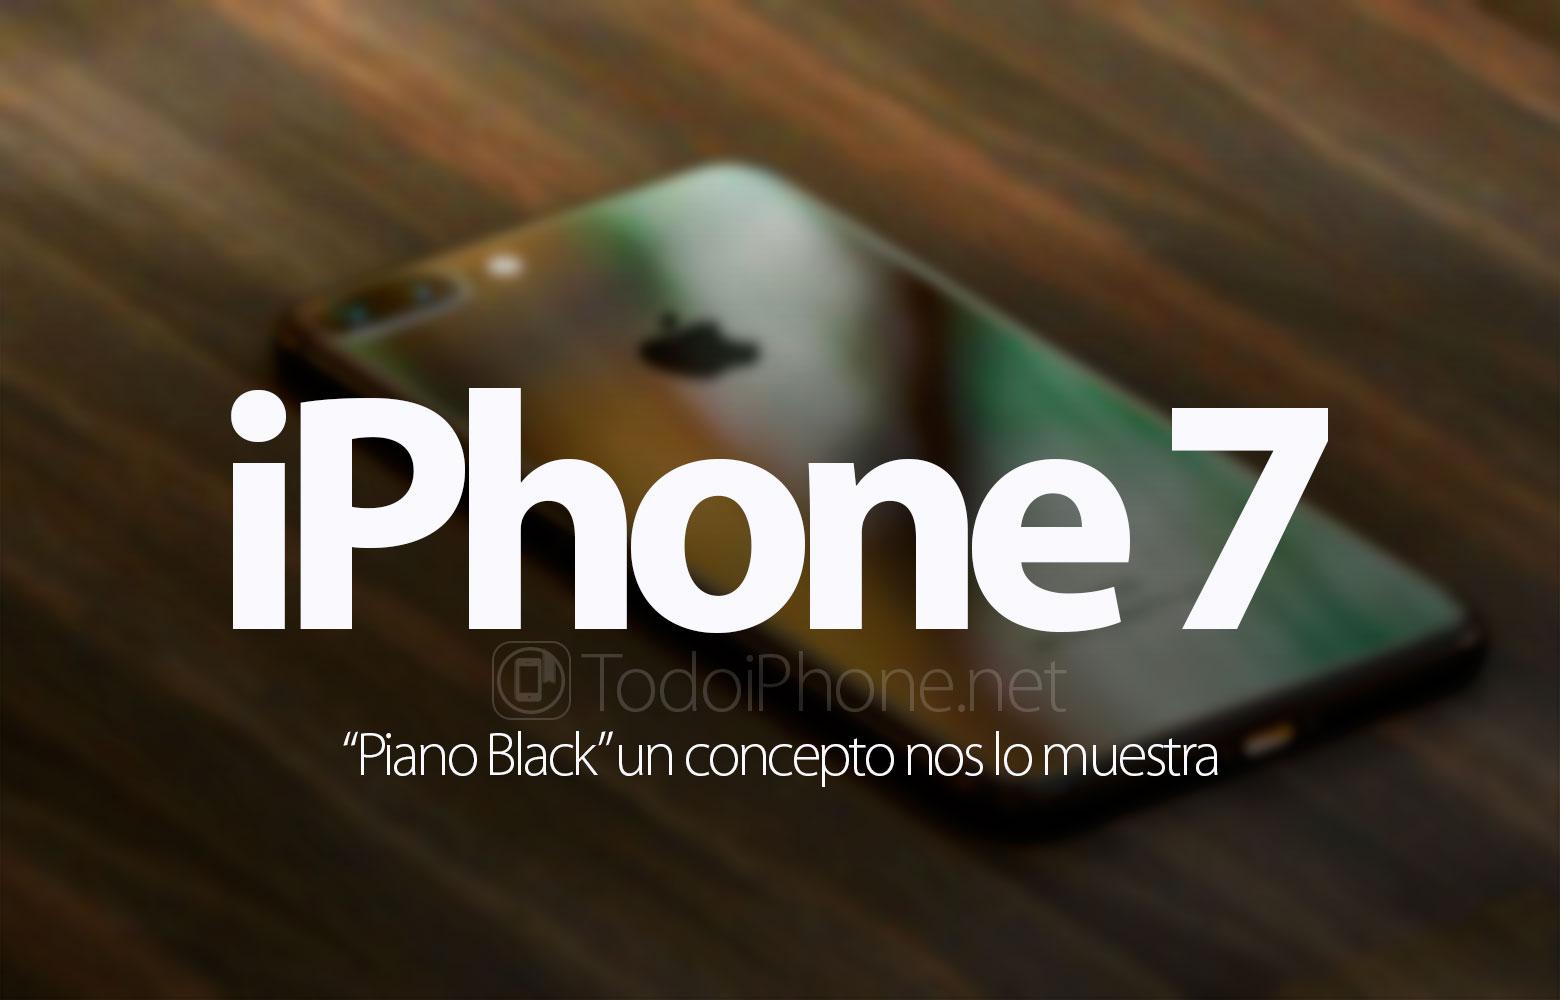 iphone-7-piano-black-concepto